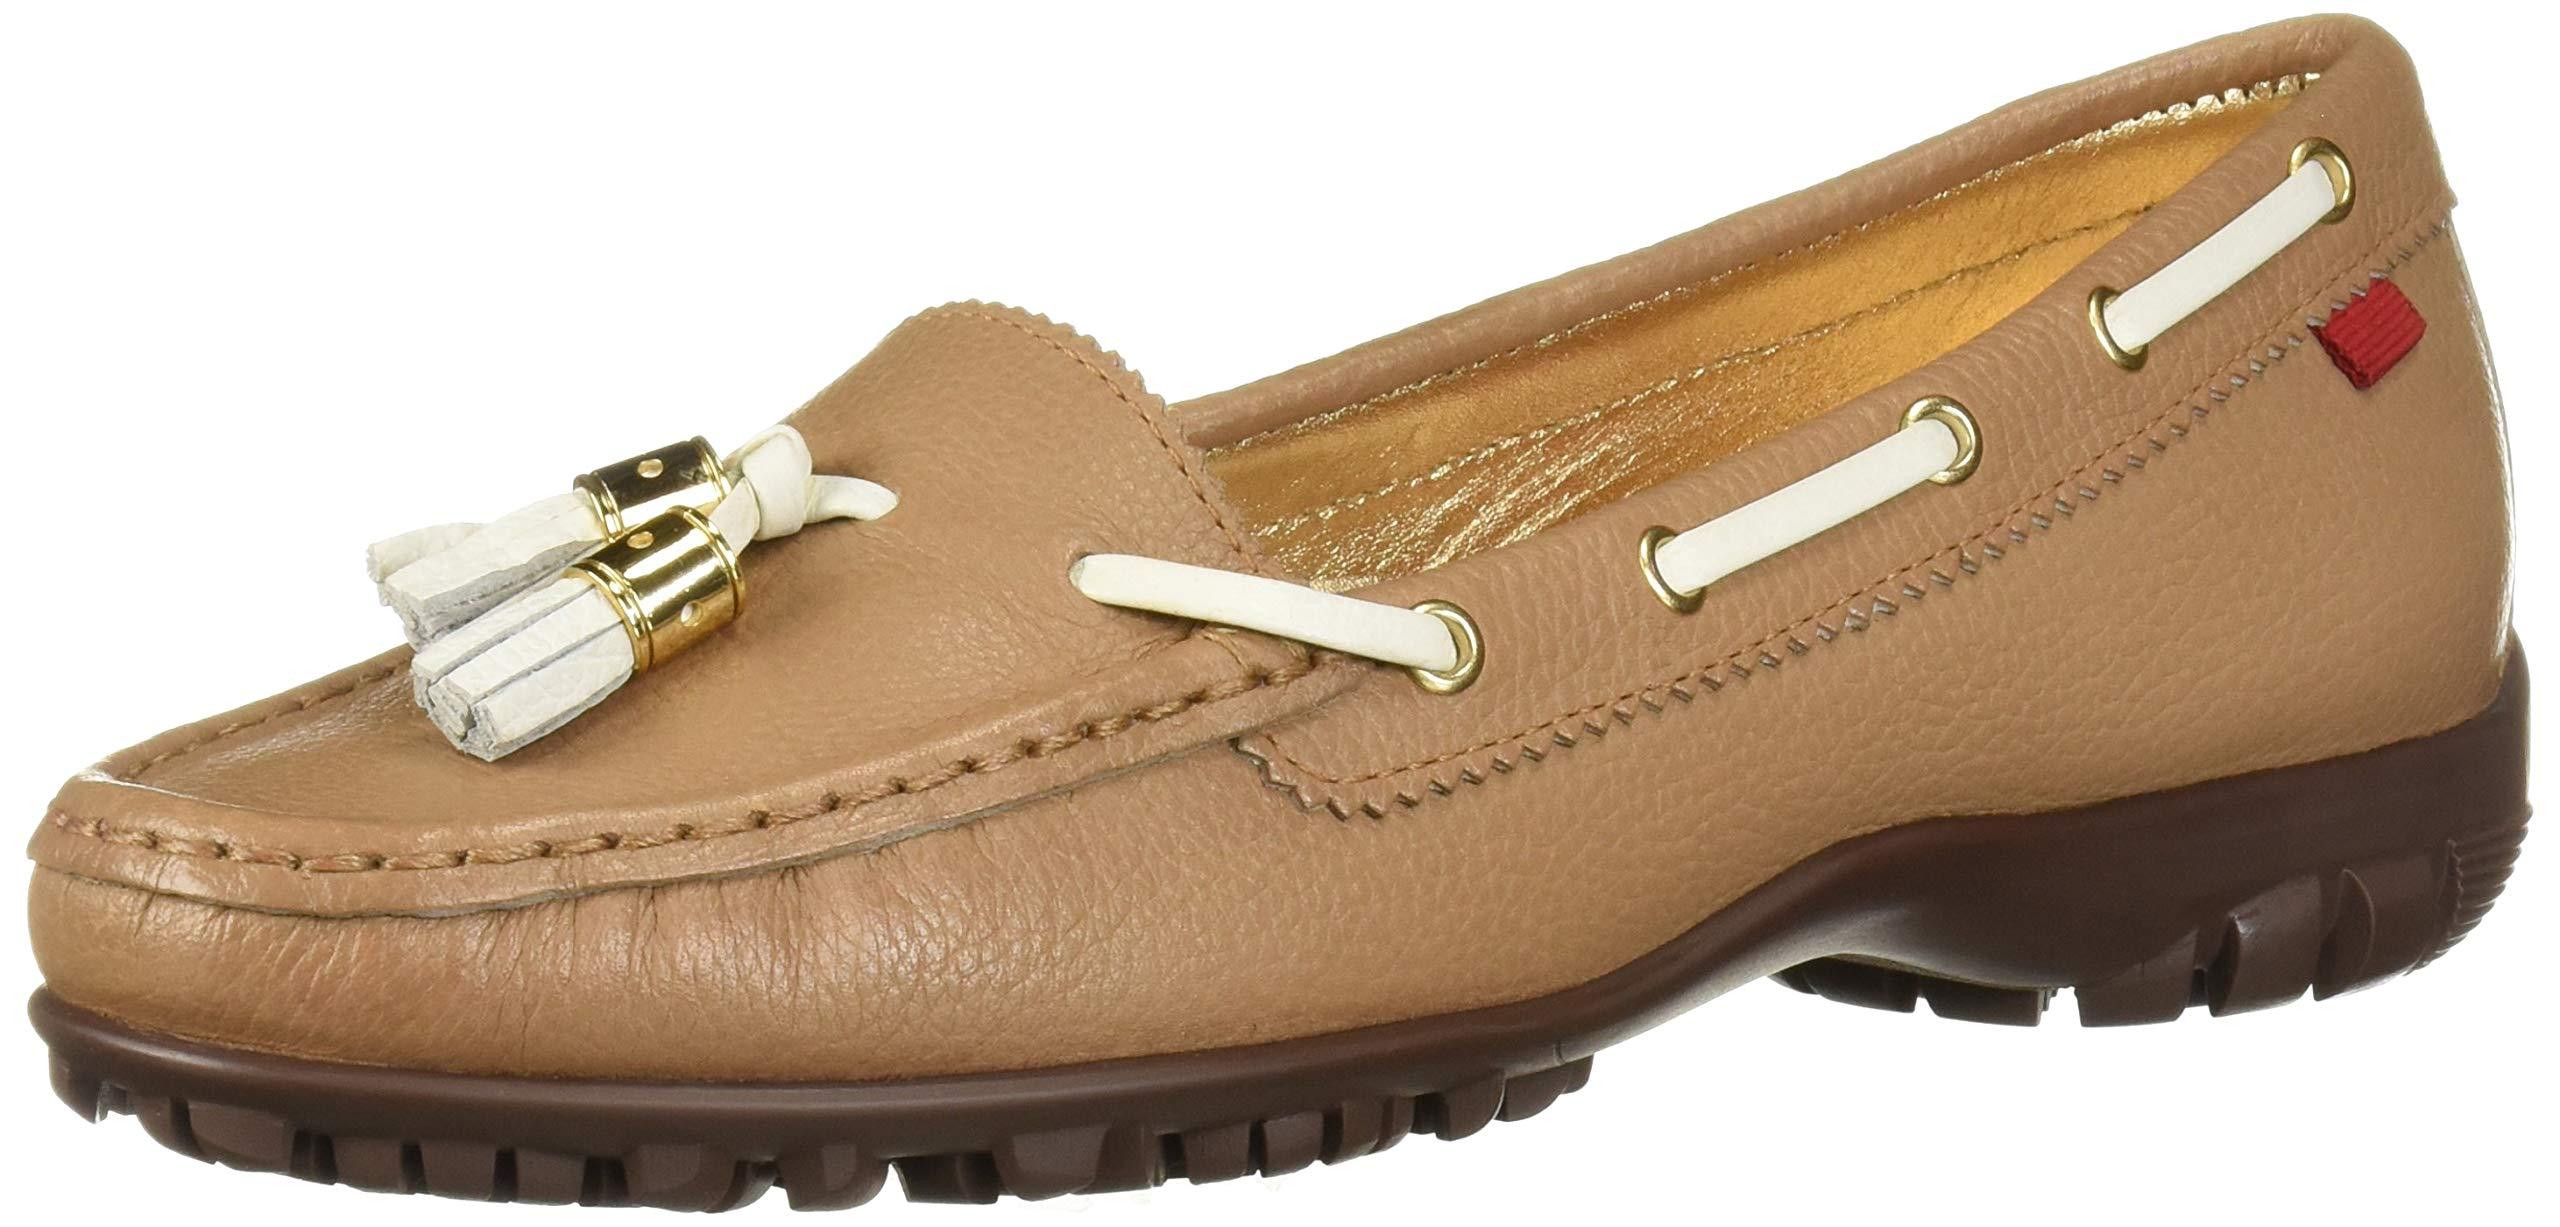 MARC JOSEPH NEW YORK Womens Leather Made in Brazil Spring Street Golf Athletic Shoe, Sand Grainy, 6 M US by MARC JOSEPH NEW YORK